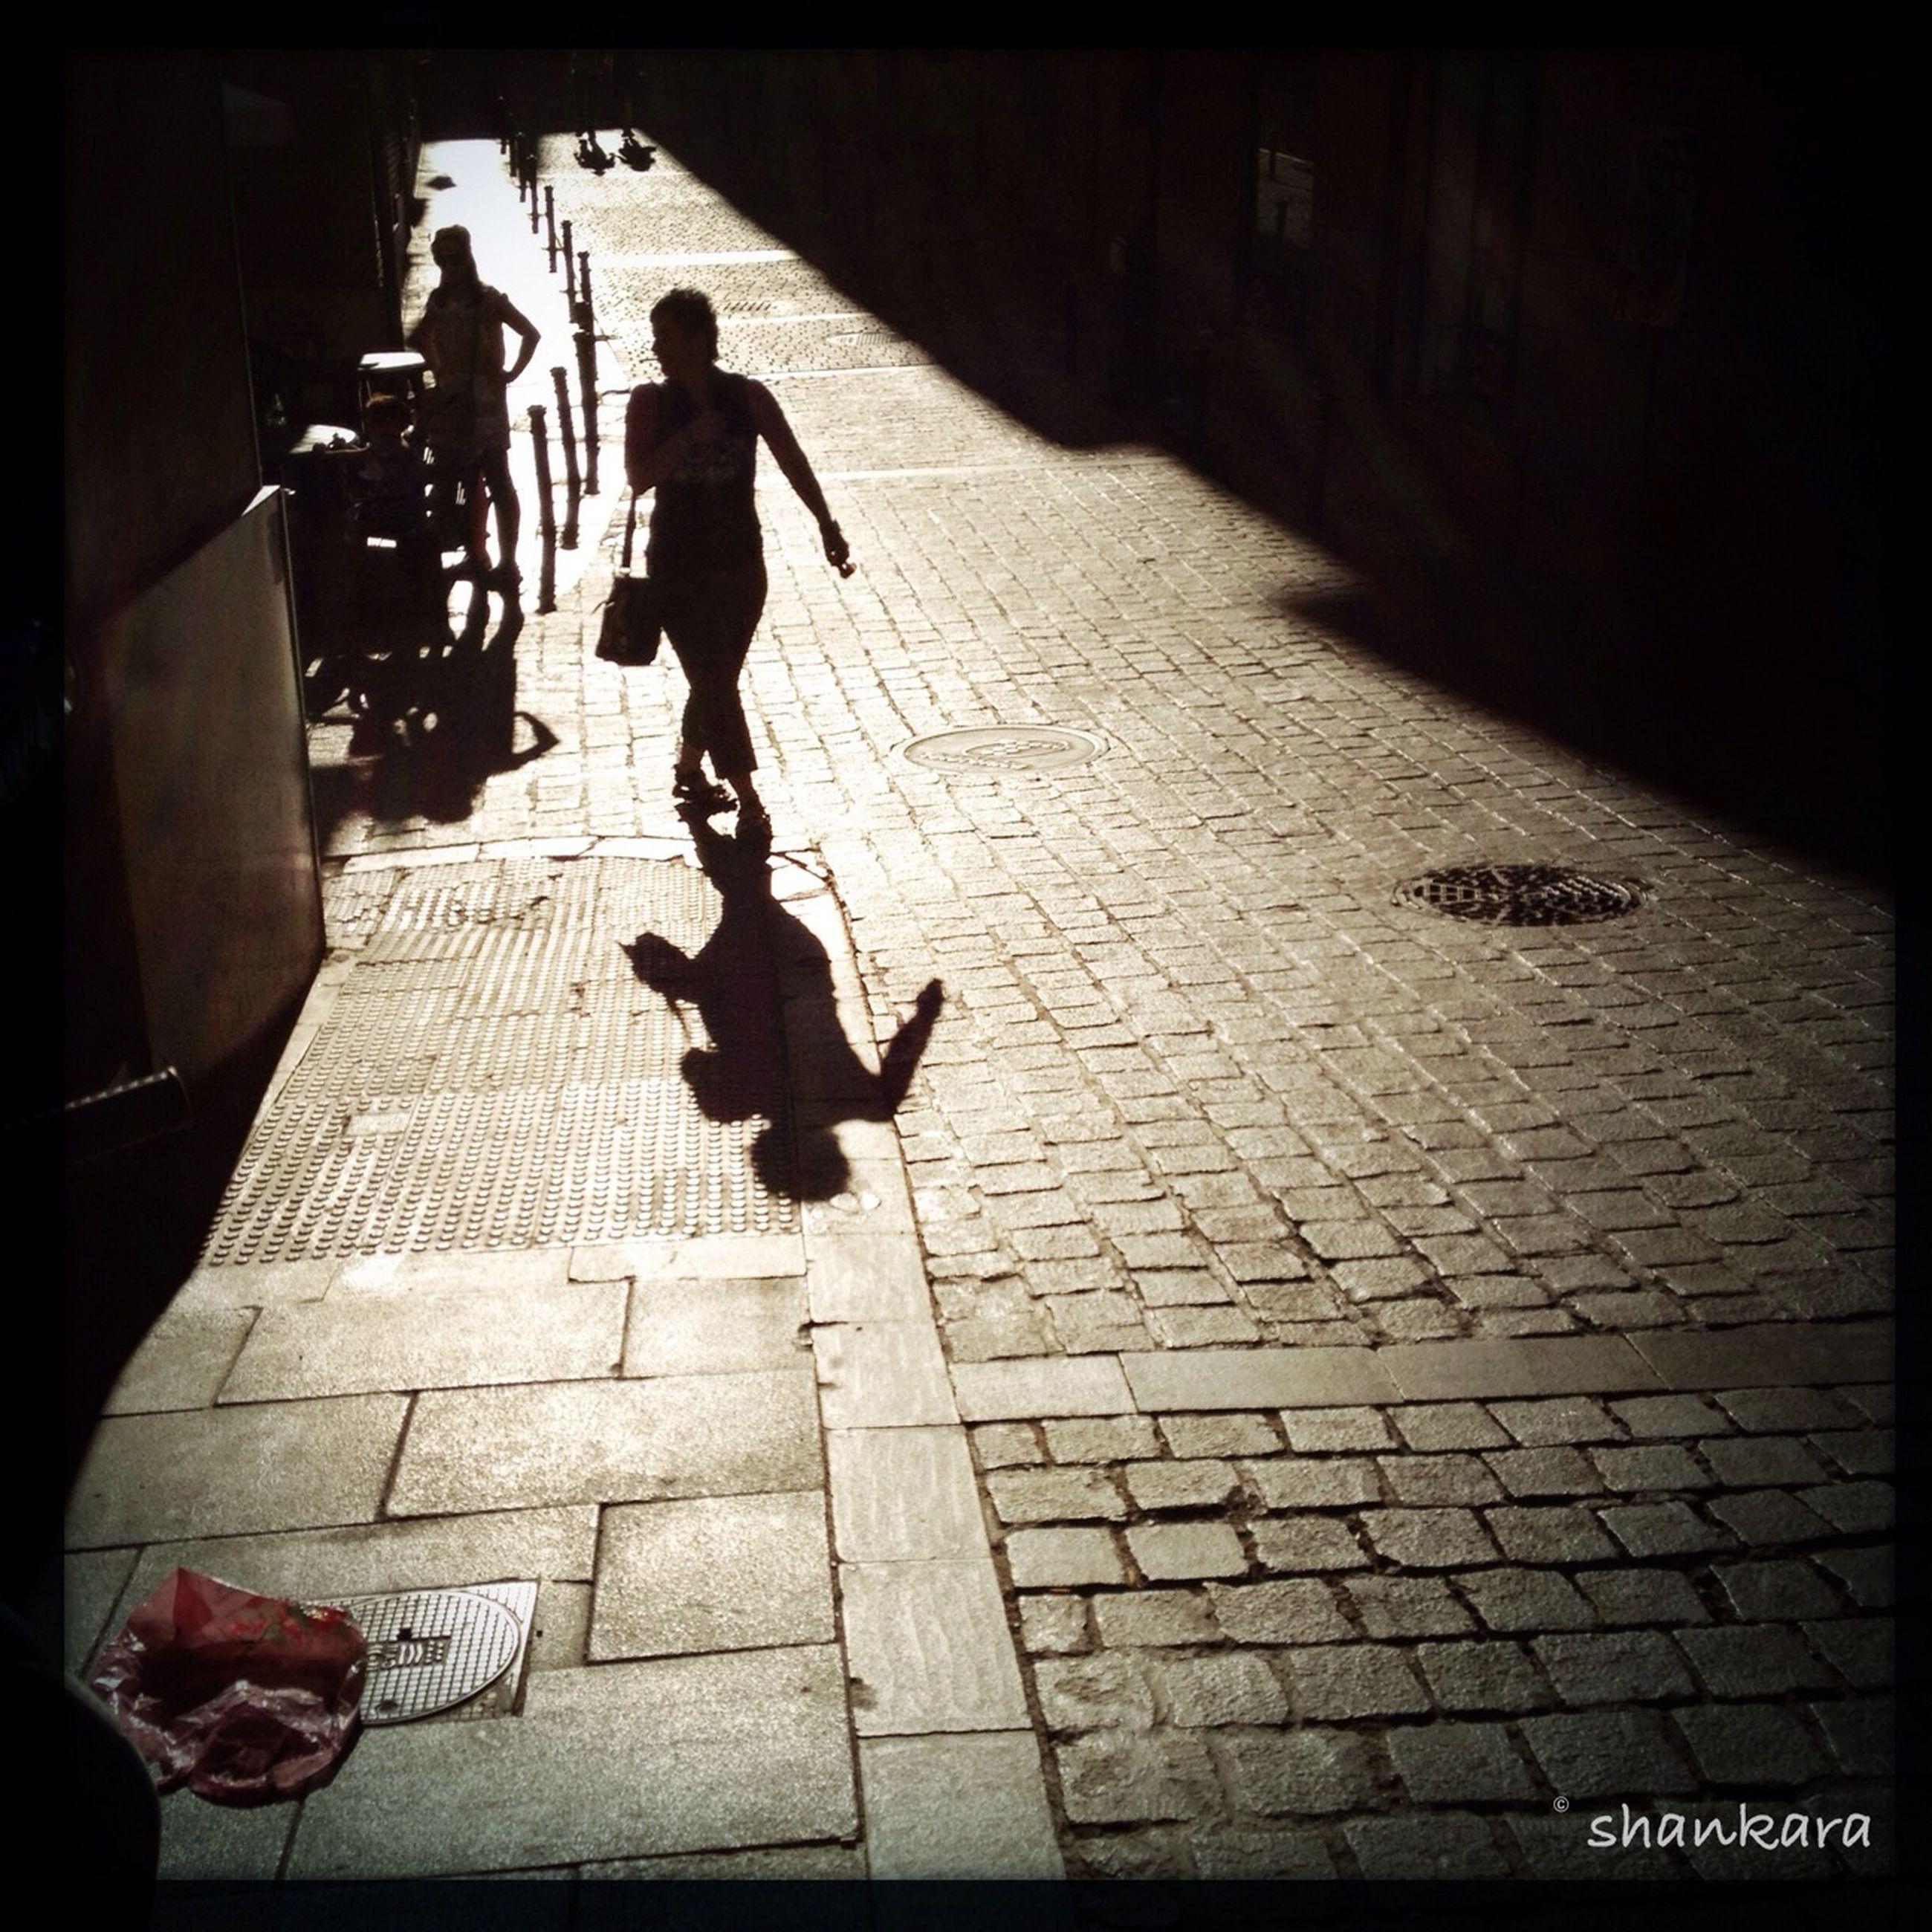 transfer print, auto post production filter, lifestyles, men, street, full length, bicycle, shadow, leisure activity, cobblestone, walking, sidewalk, transportation, person, sunlight, paving stone, city life